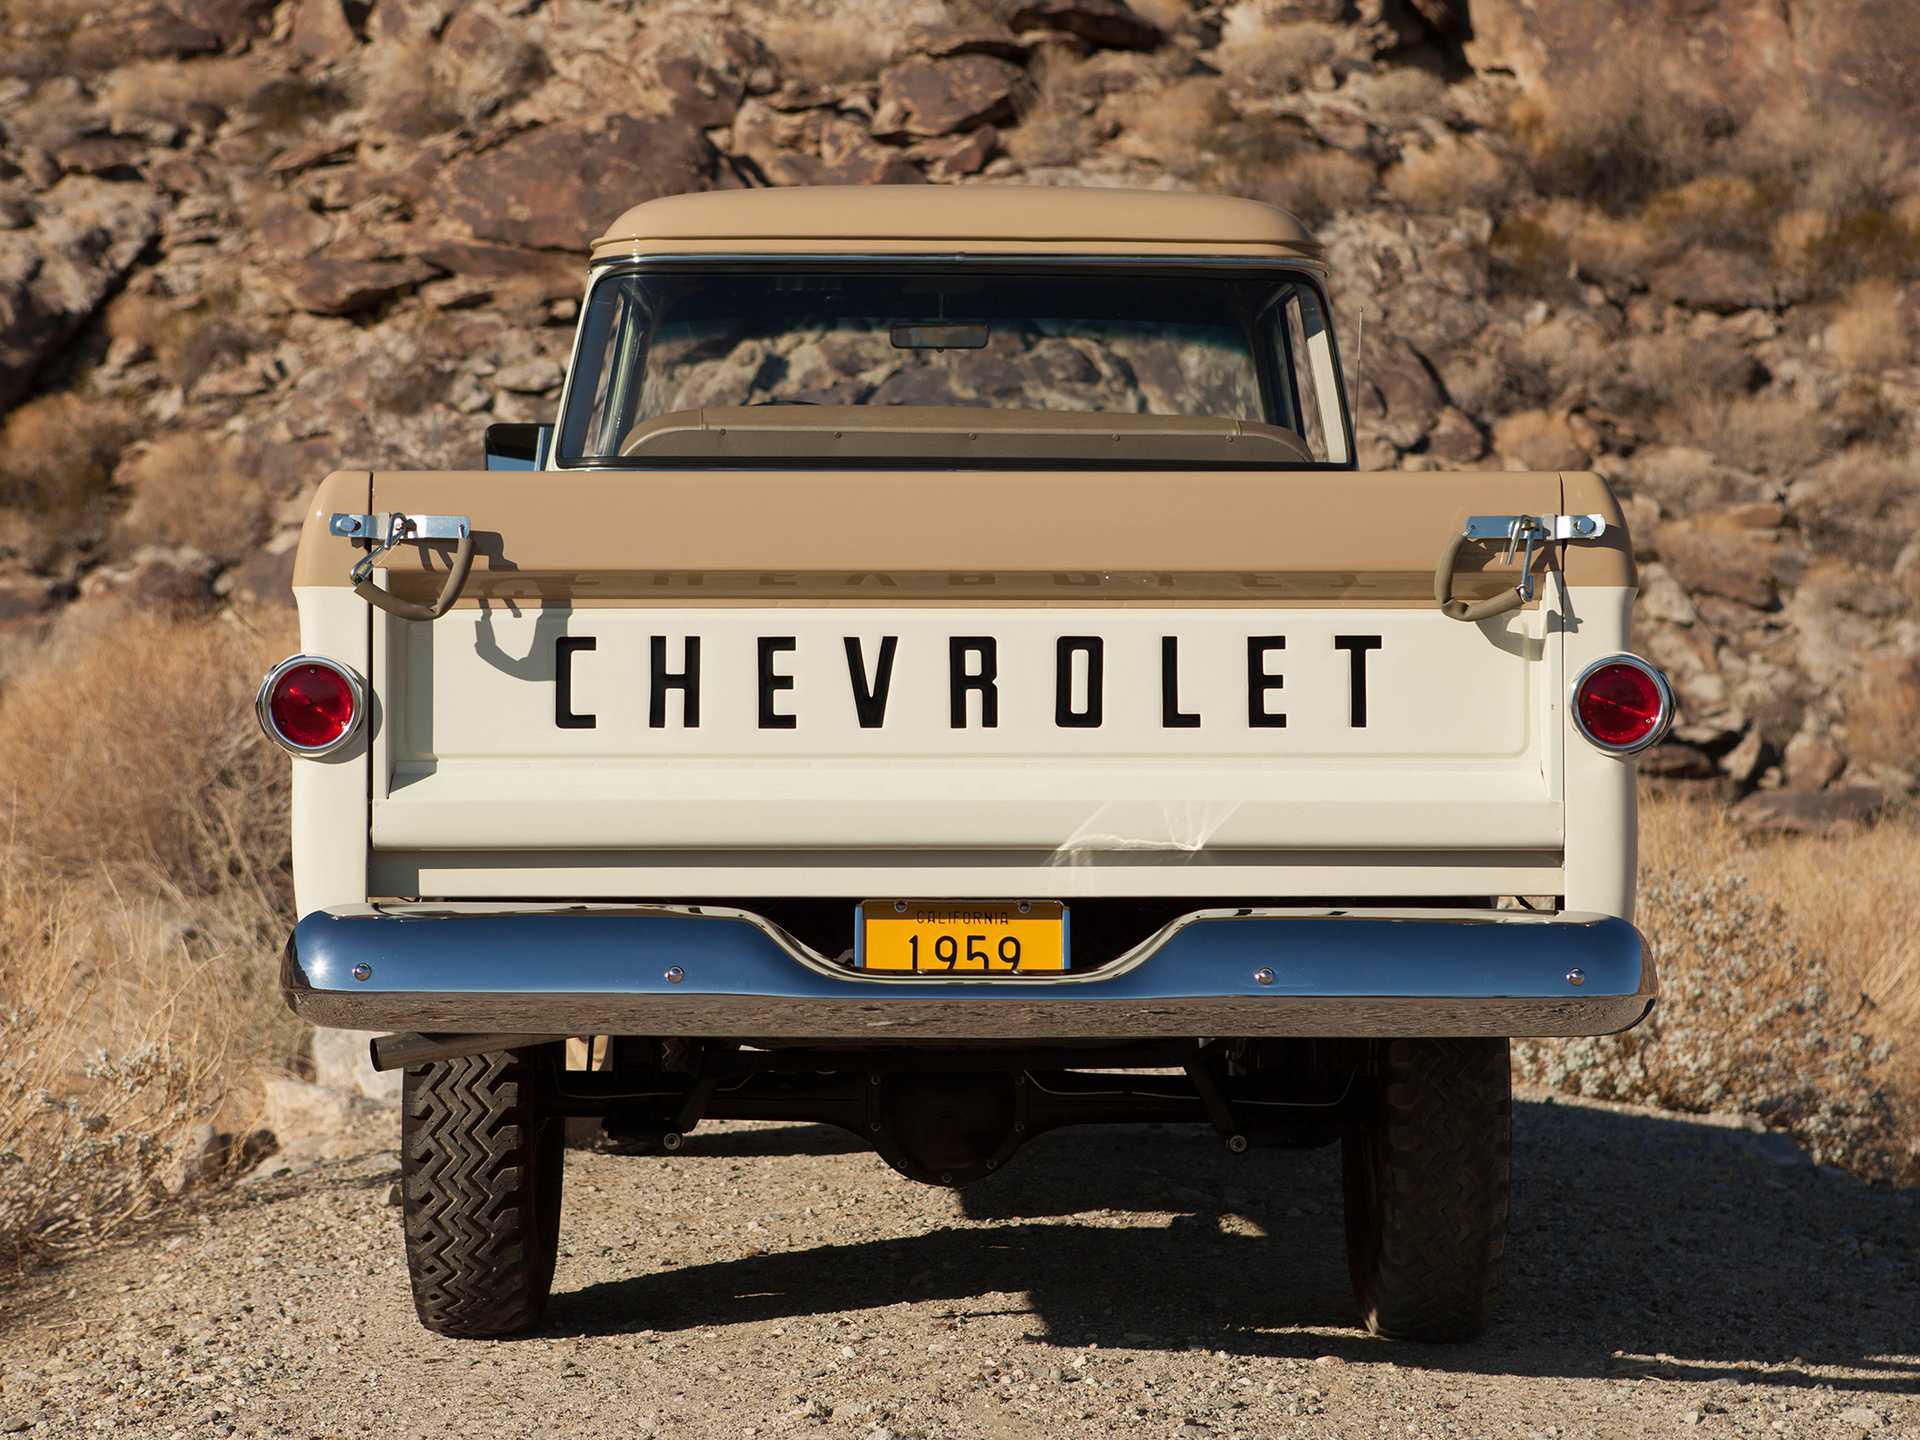 Chevrolet Apache 31/32 Fleetside NAPCO Powr-Pak 3.9 4x4 Manual, 137hp, 1959